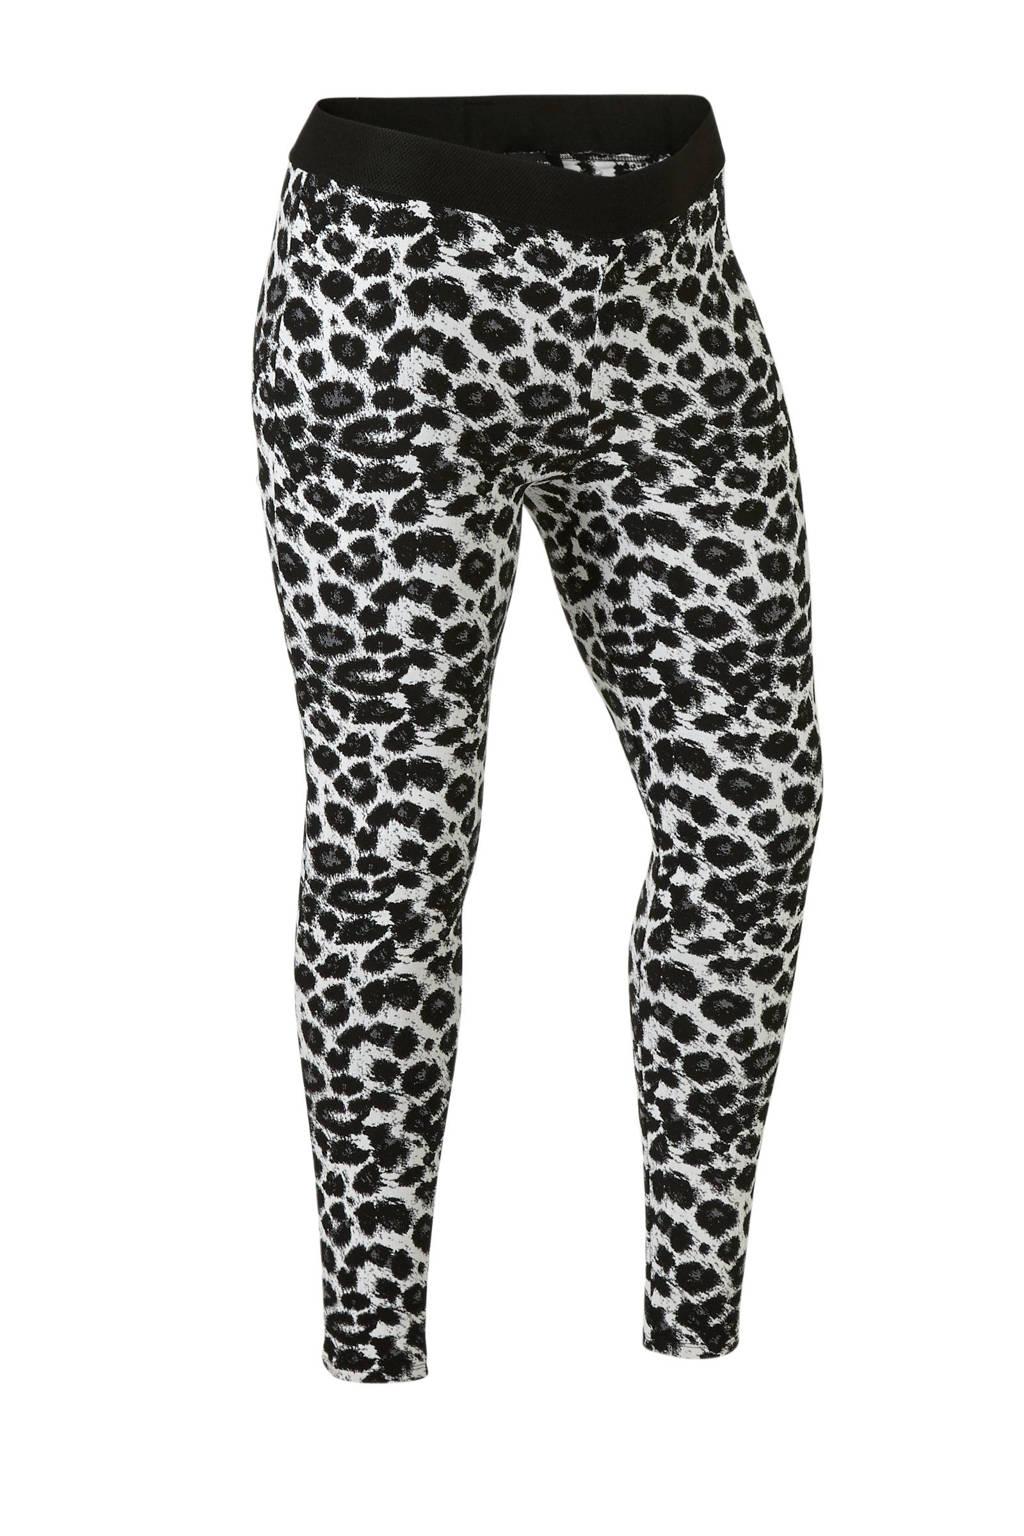 anytime Plus size legging in panter dessin zwart/ecru, Zwart/ecru/grijs